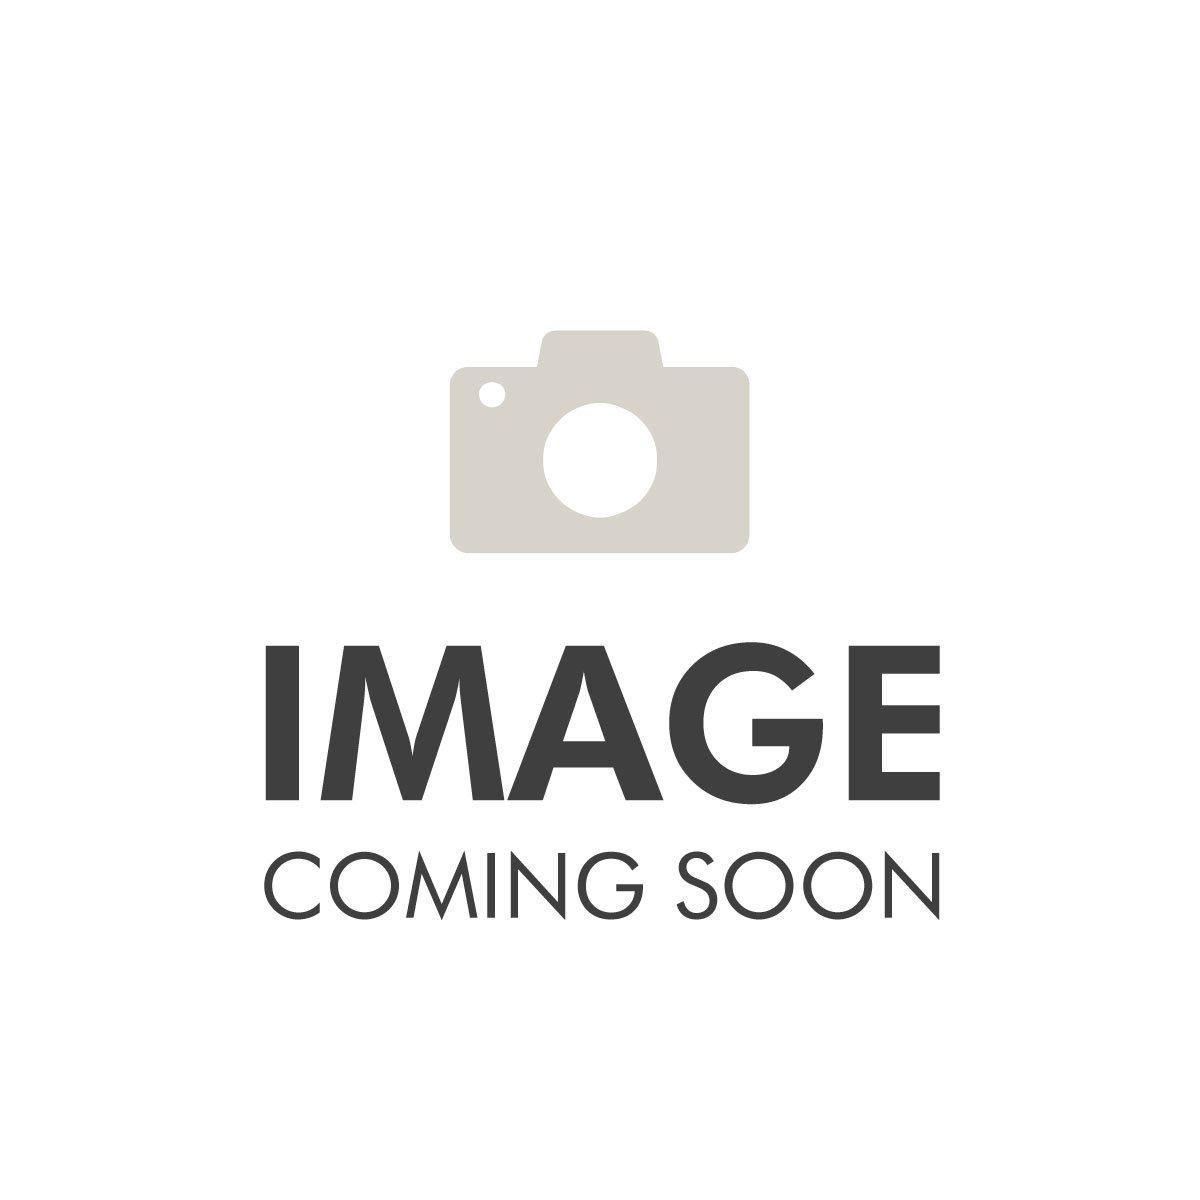 Uhlmann - Dry Foil/Sabre Pad - PVC